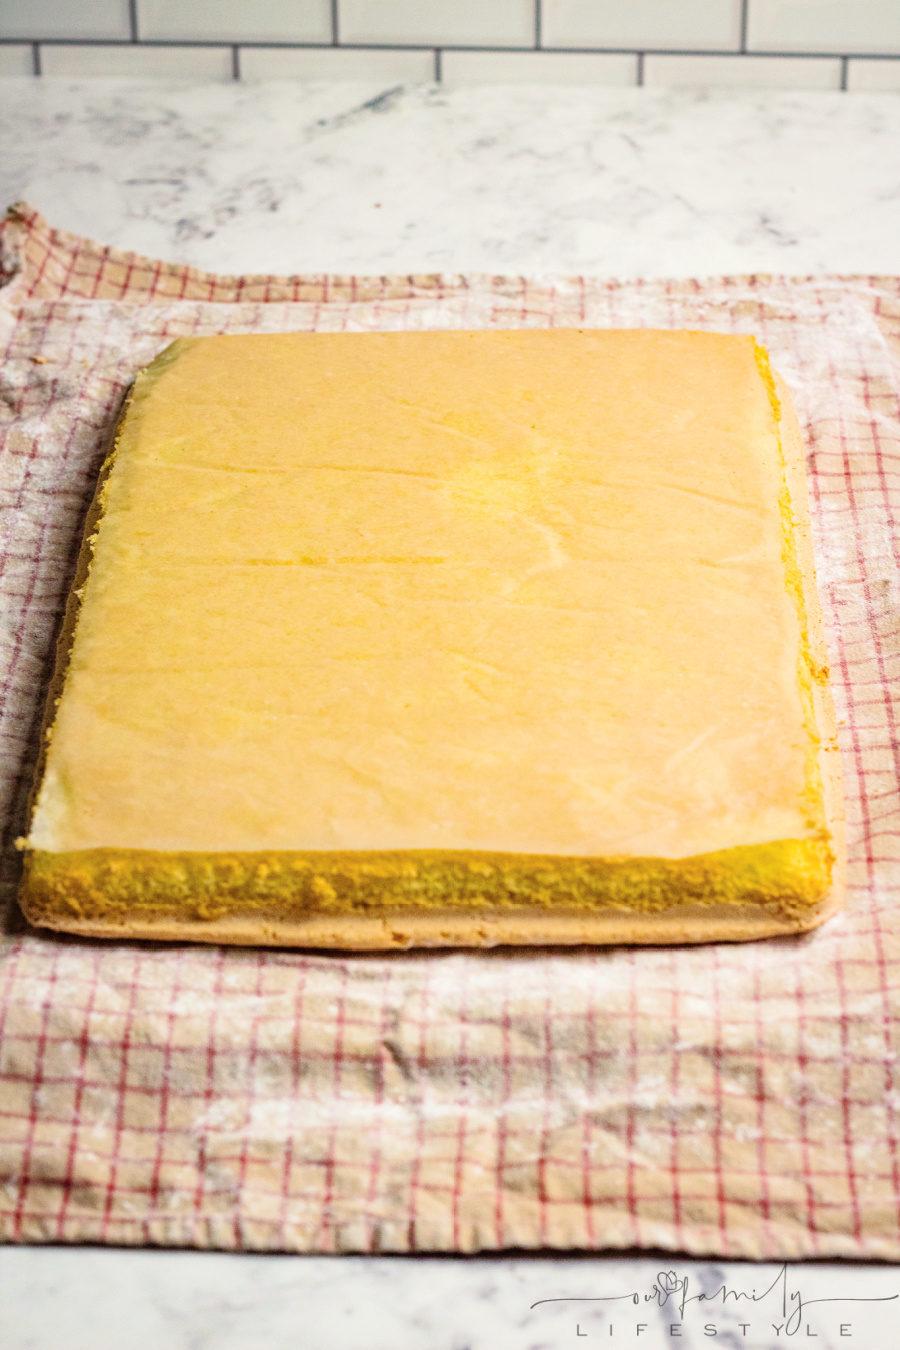 immediately turn cake roll onto dishtowel sprinkled with powdered sugar